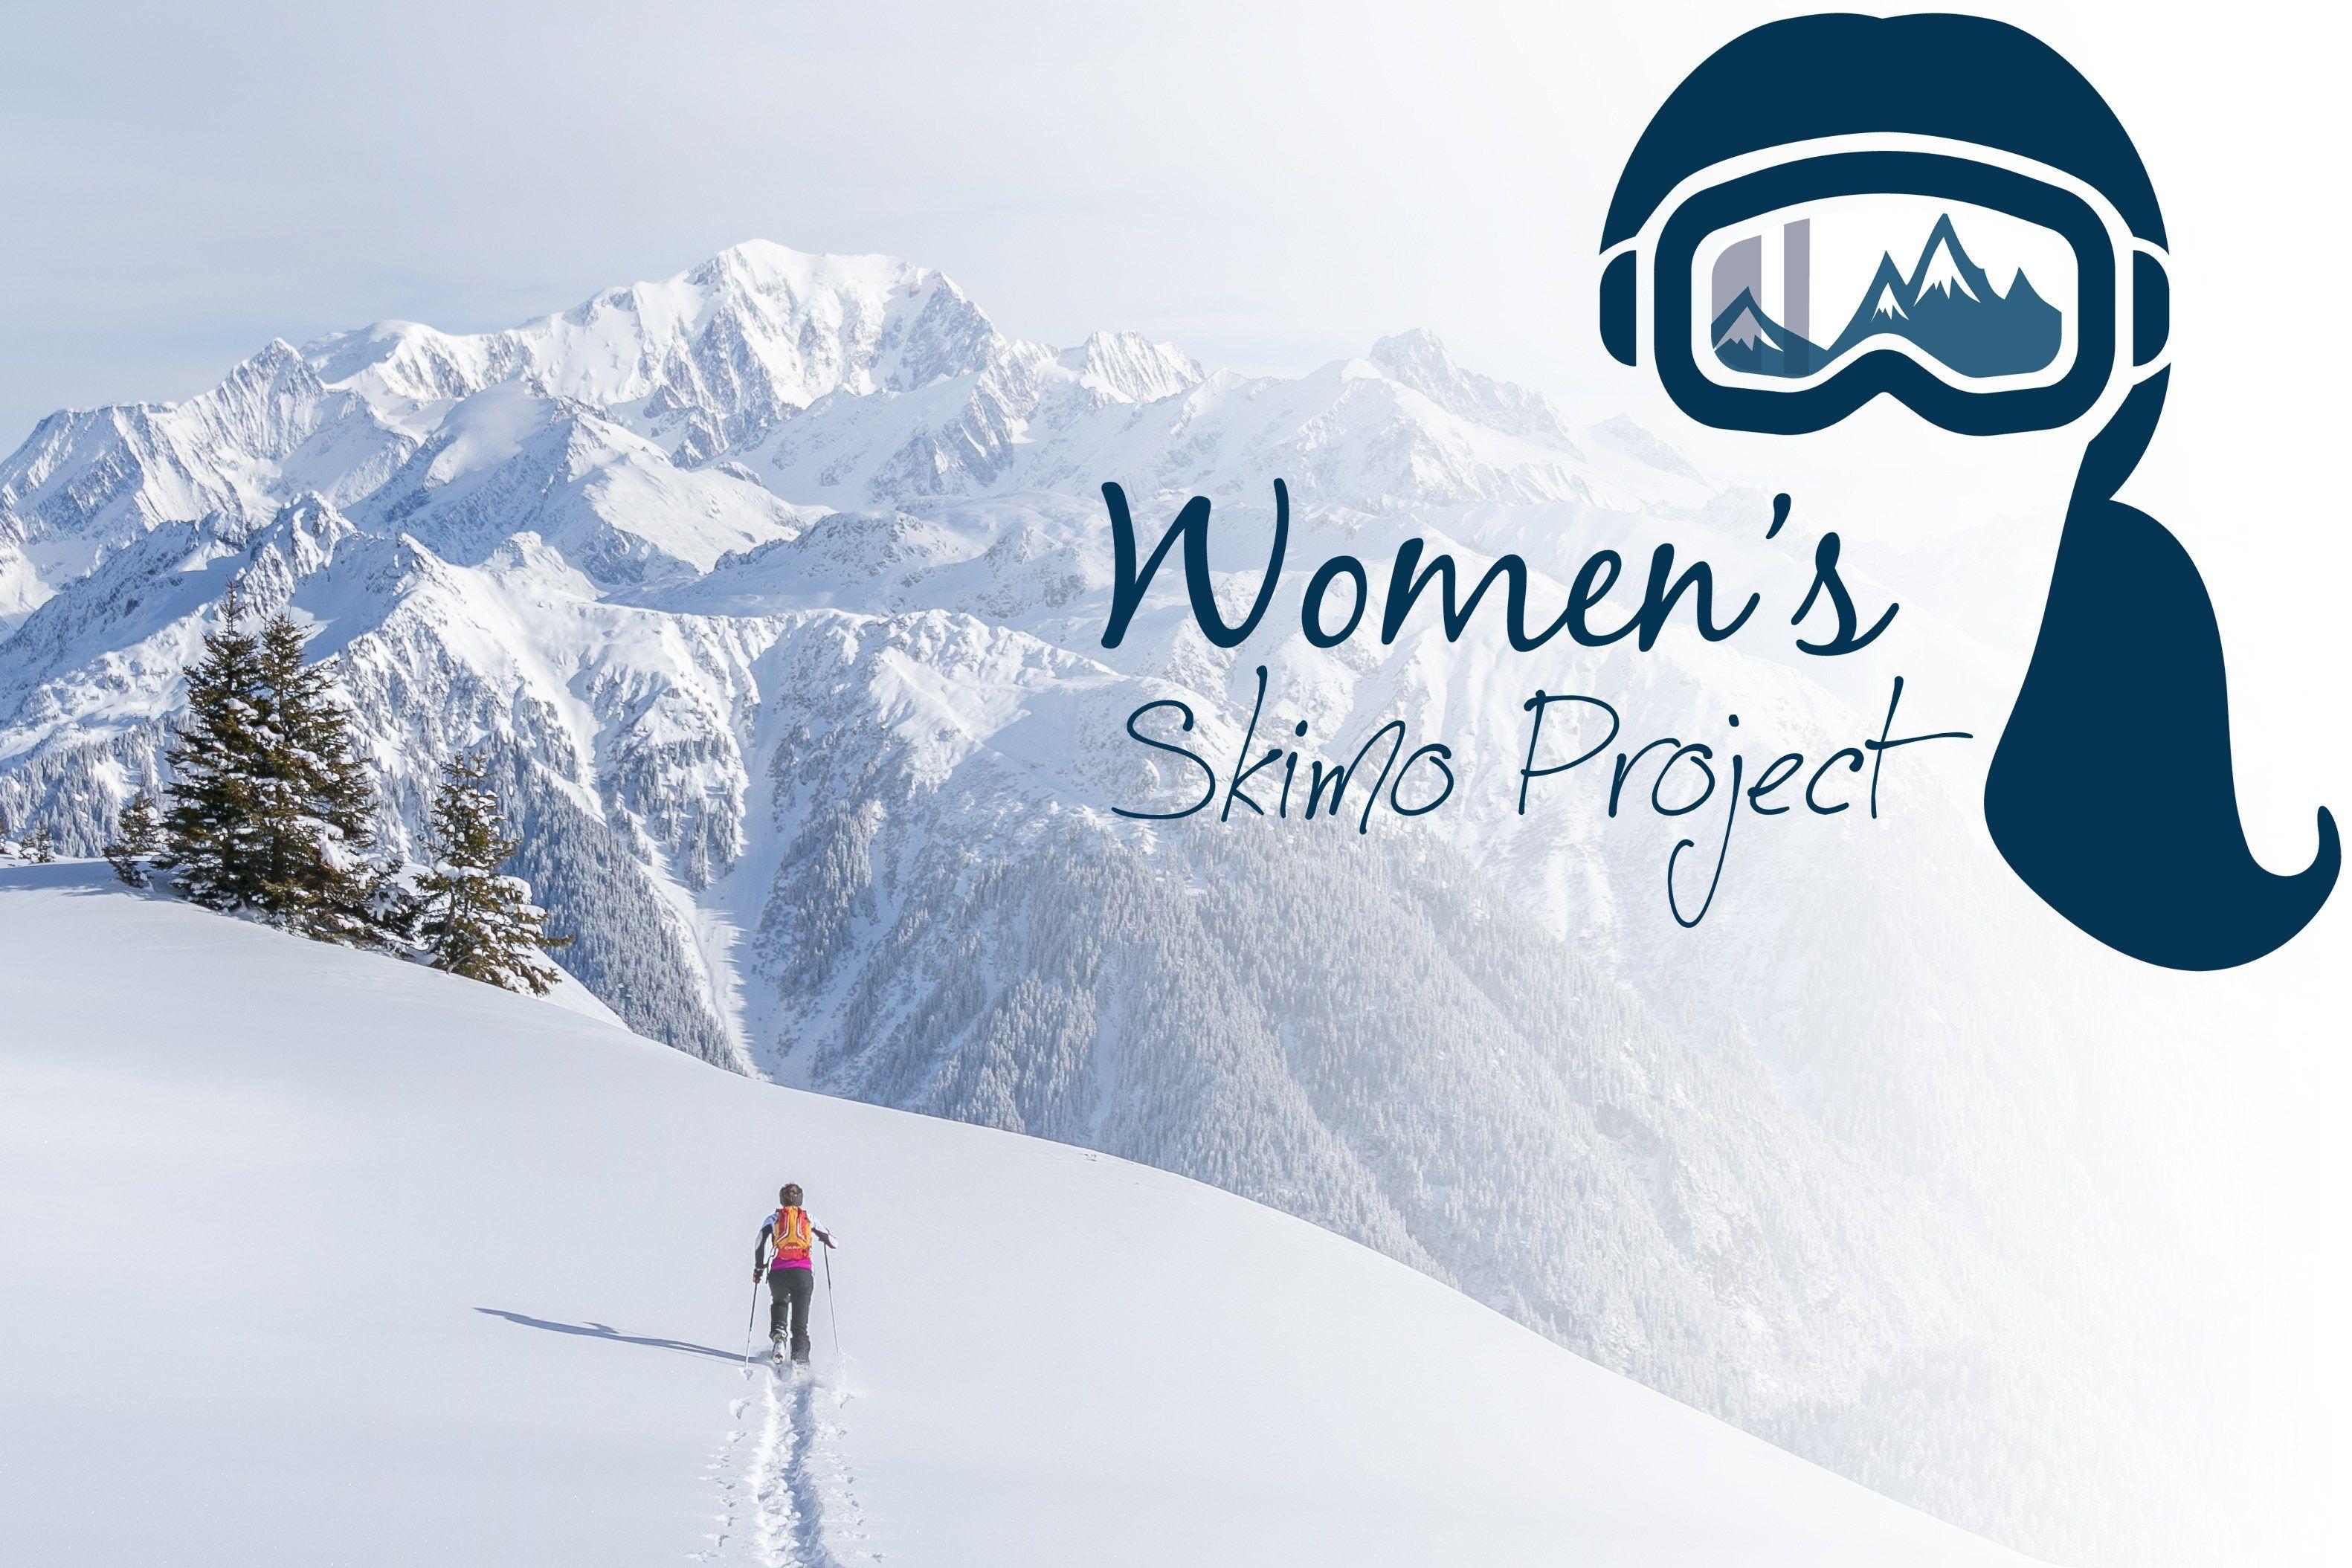 women's skimo project #crowdfunding #kisskissbankbank #ski #montgane #sportive #skimo #rando #japon